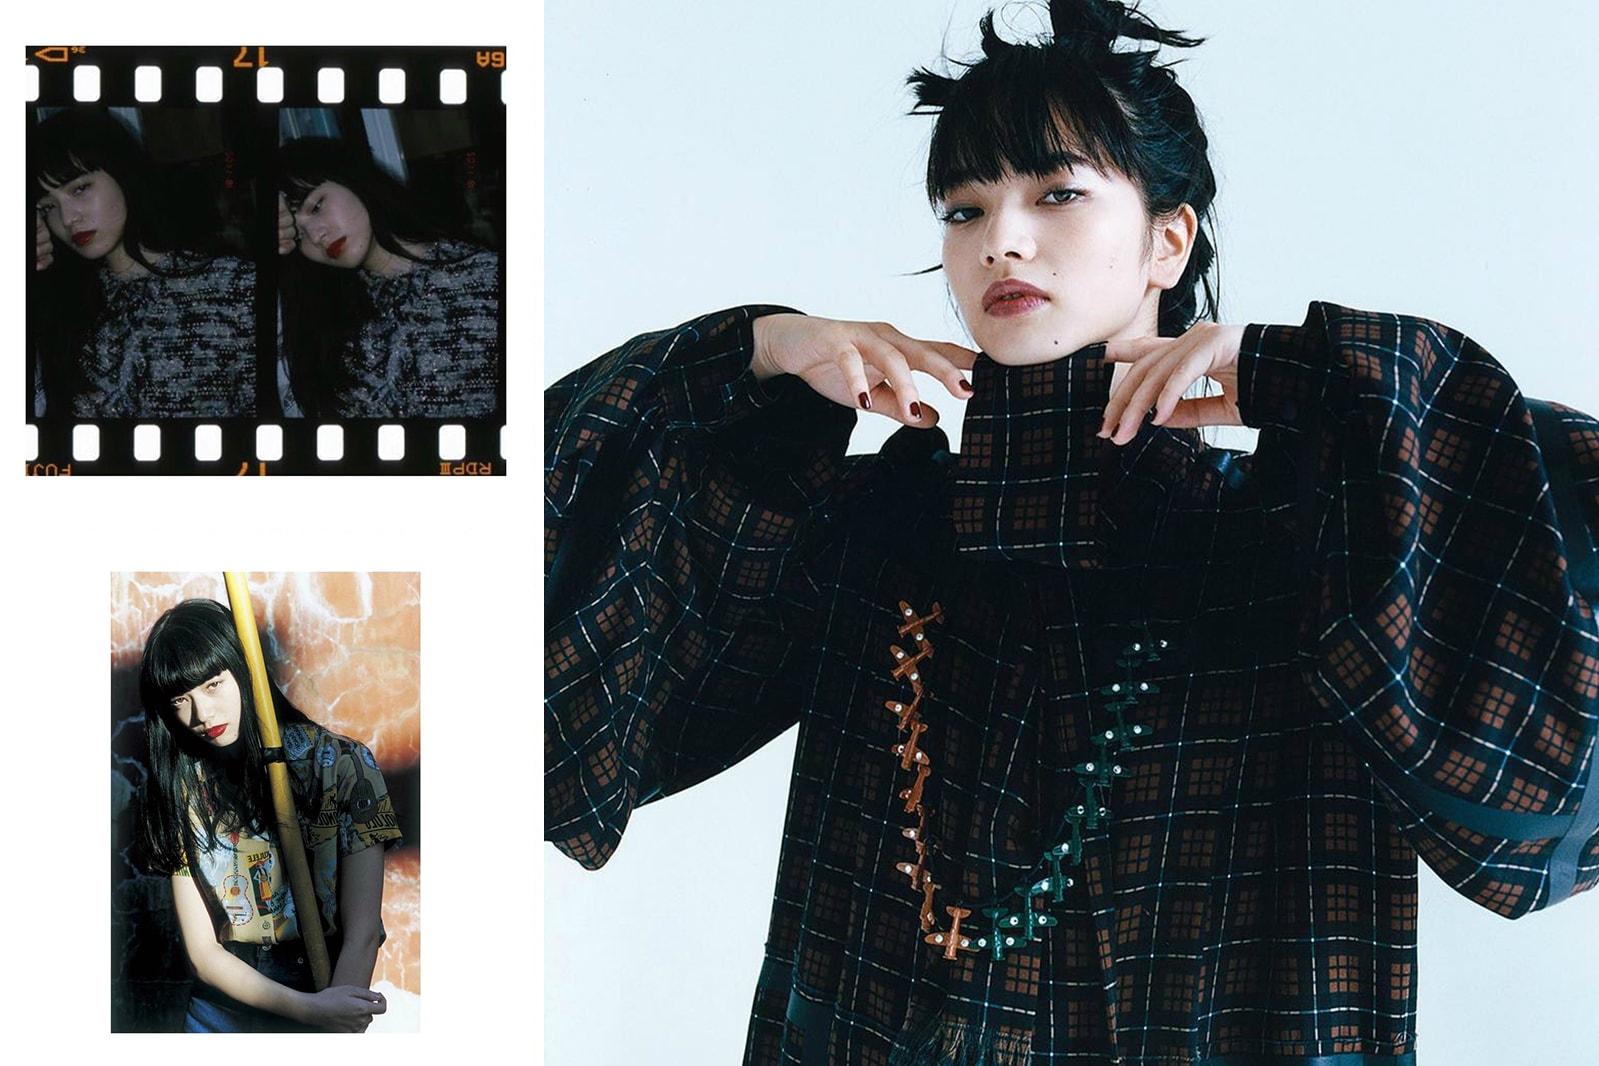 Japanese Influencers HYPEBAE Favorite Instagram Accounts mademoiselle yulia Julia Abe Hikari Mori Lala Takahashi Nana Komatsu